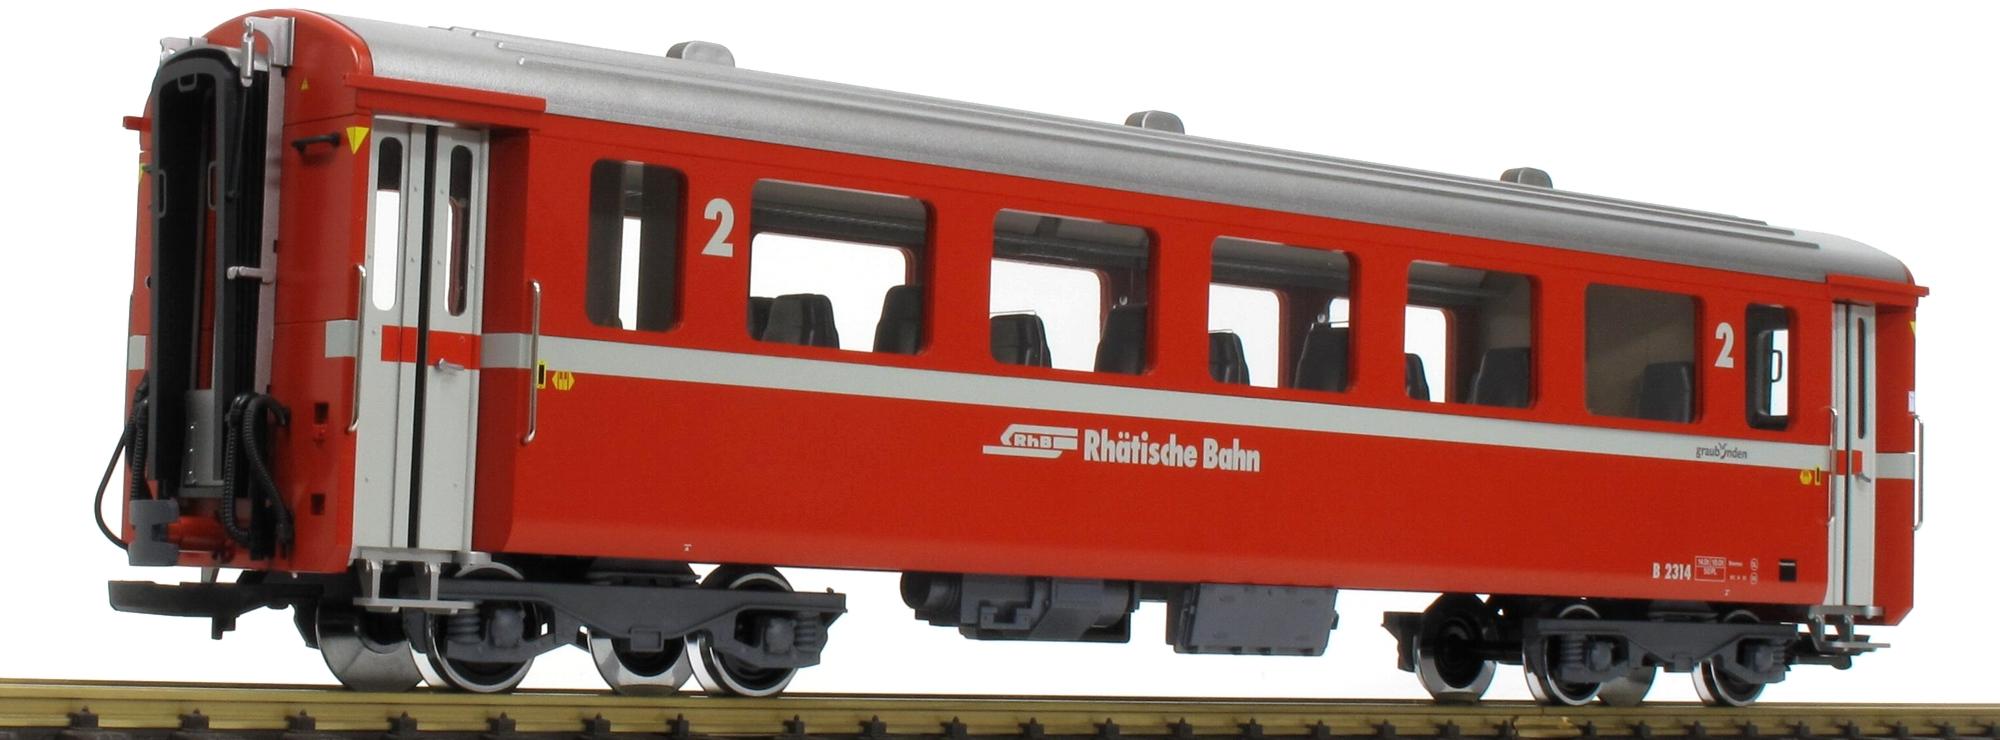 LGB 30676 RhB Schnellzugwagen B 2314 Spur G